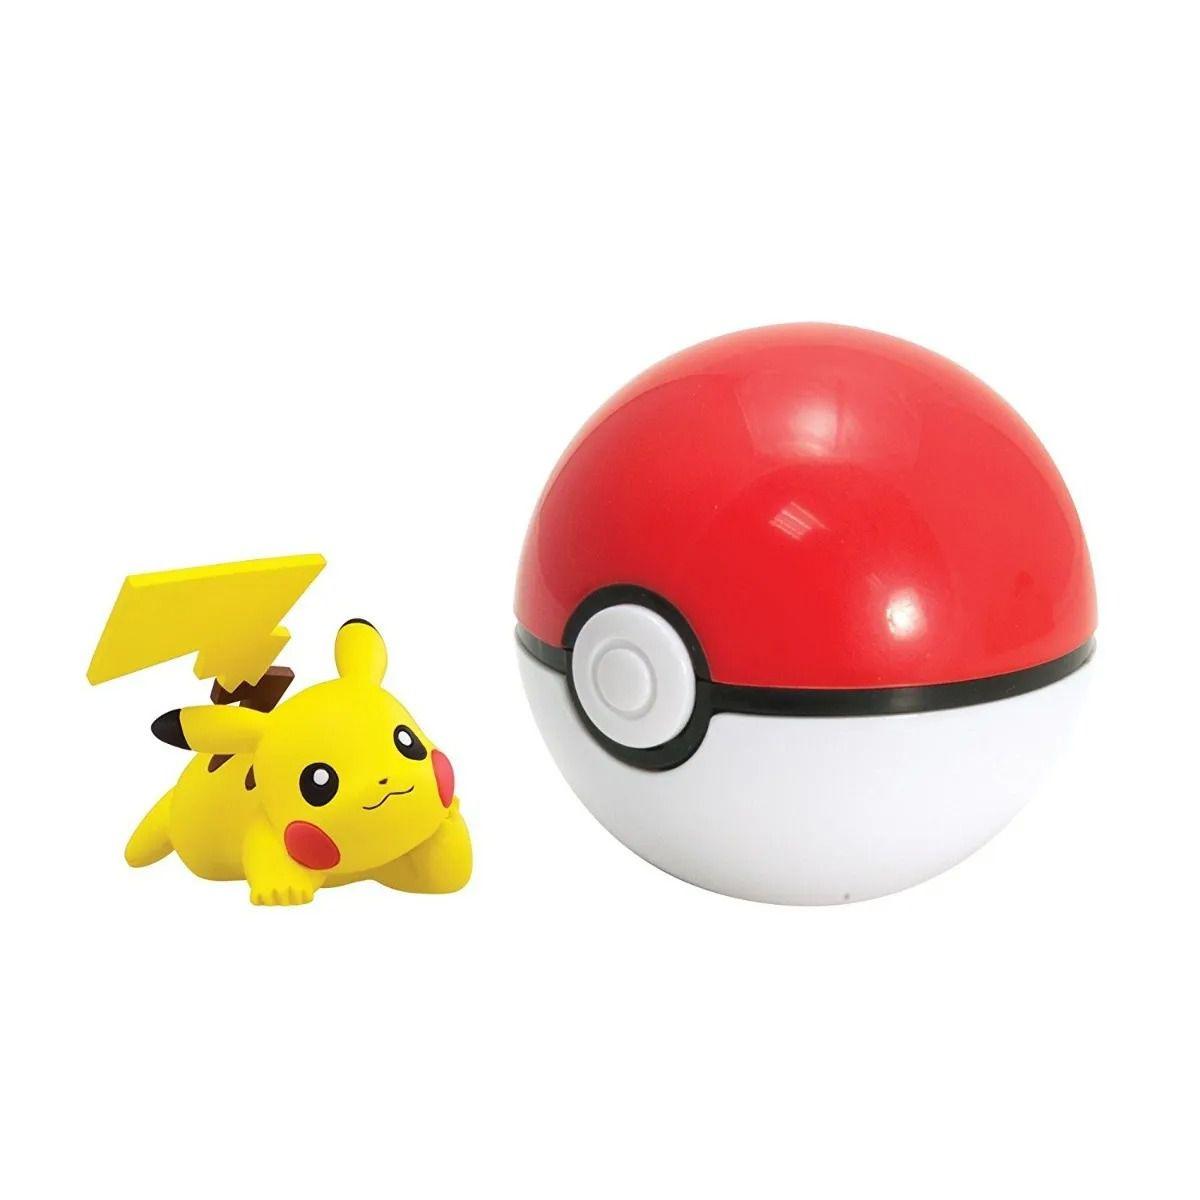 Pokémon – Kit 4 bonecos Pikachu,Machop,Alolan,Carbink e 4 Pokébola Clip Carry - Tomy